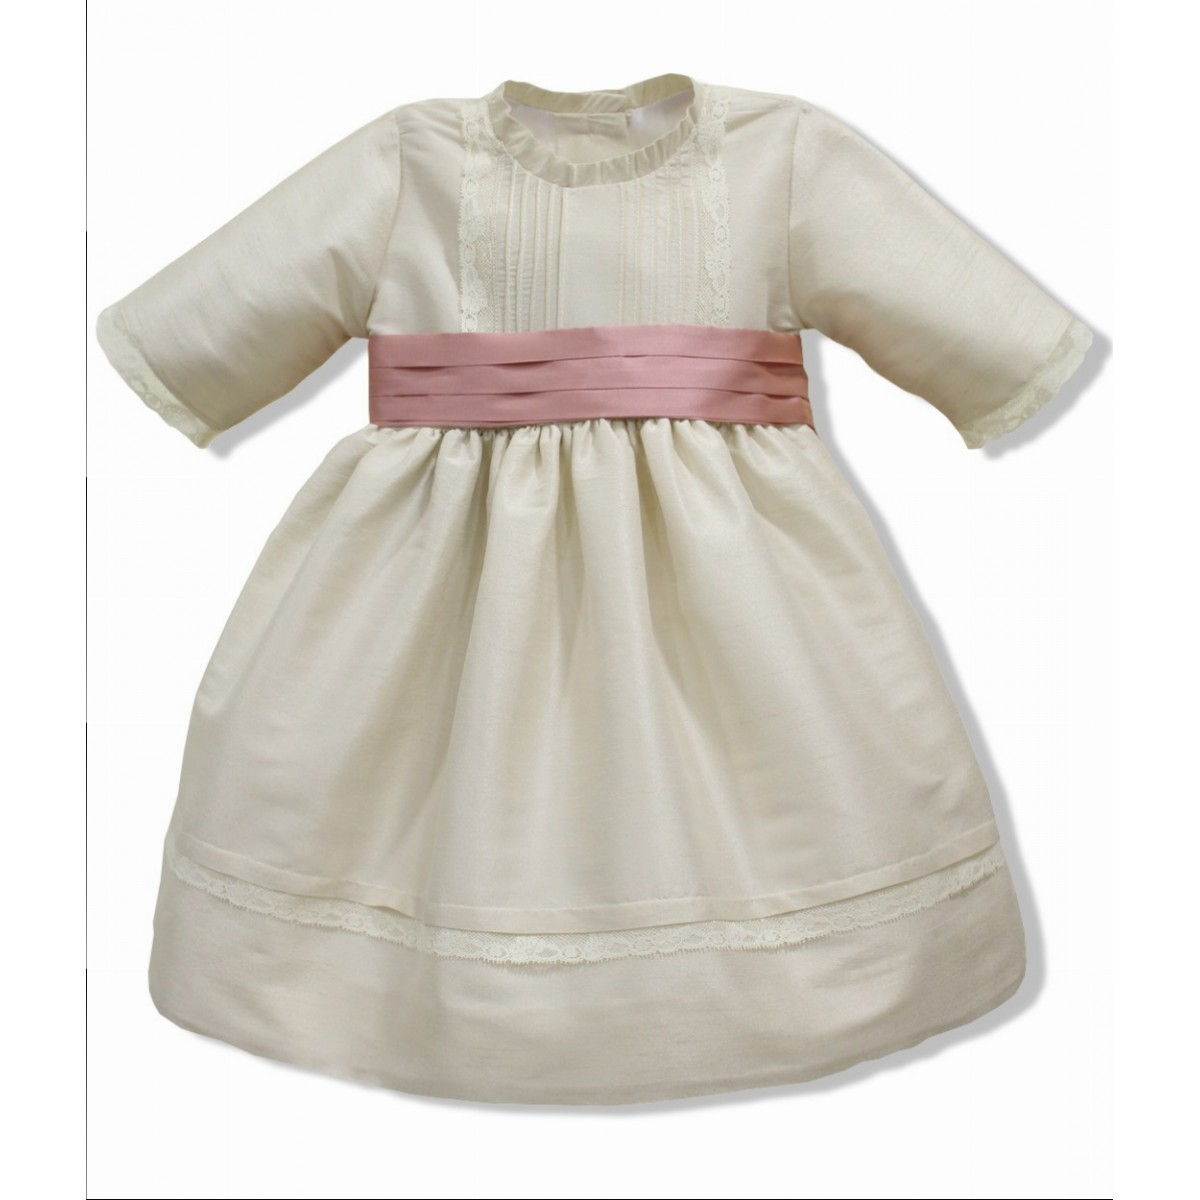 Chapagne Silk Flower Girl Dress Three Quarter Sleeves Golositos